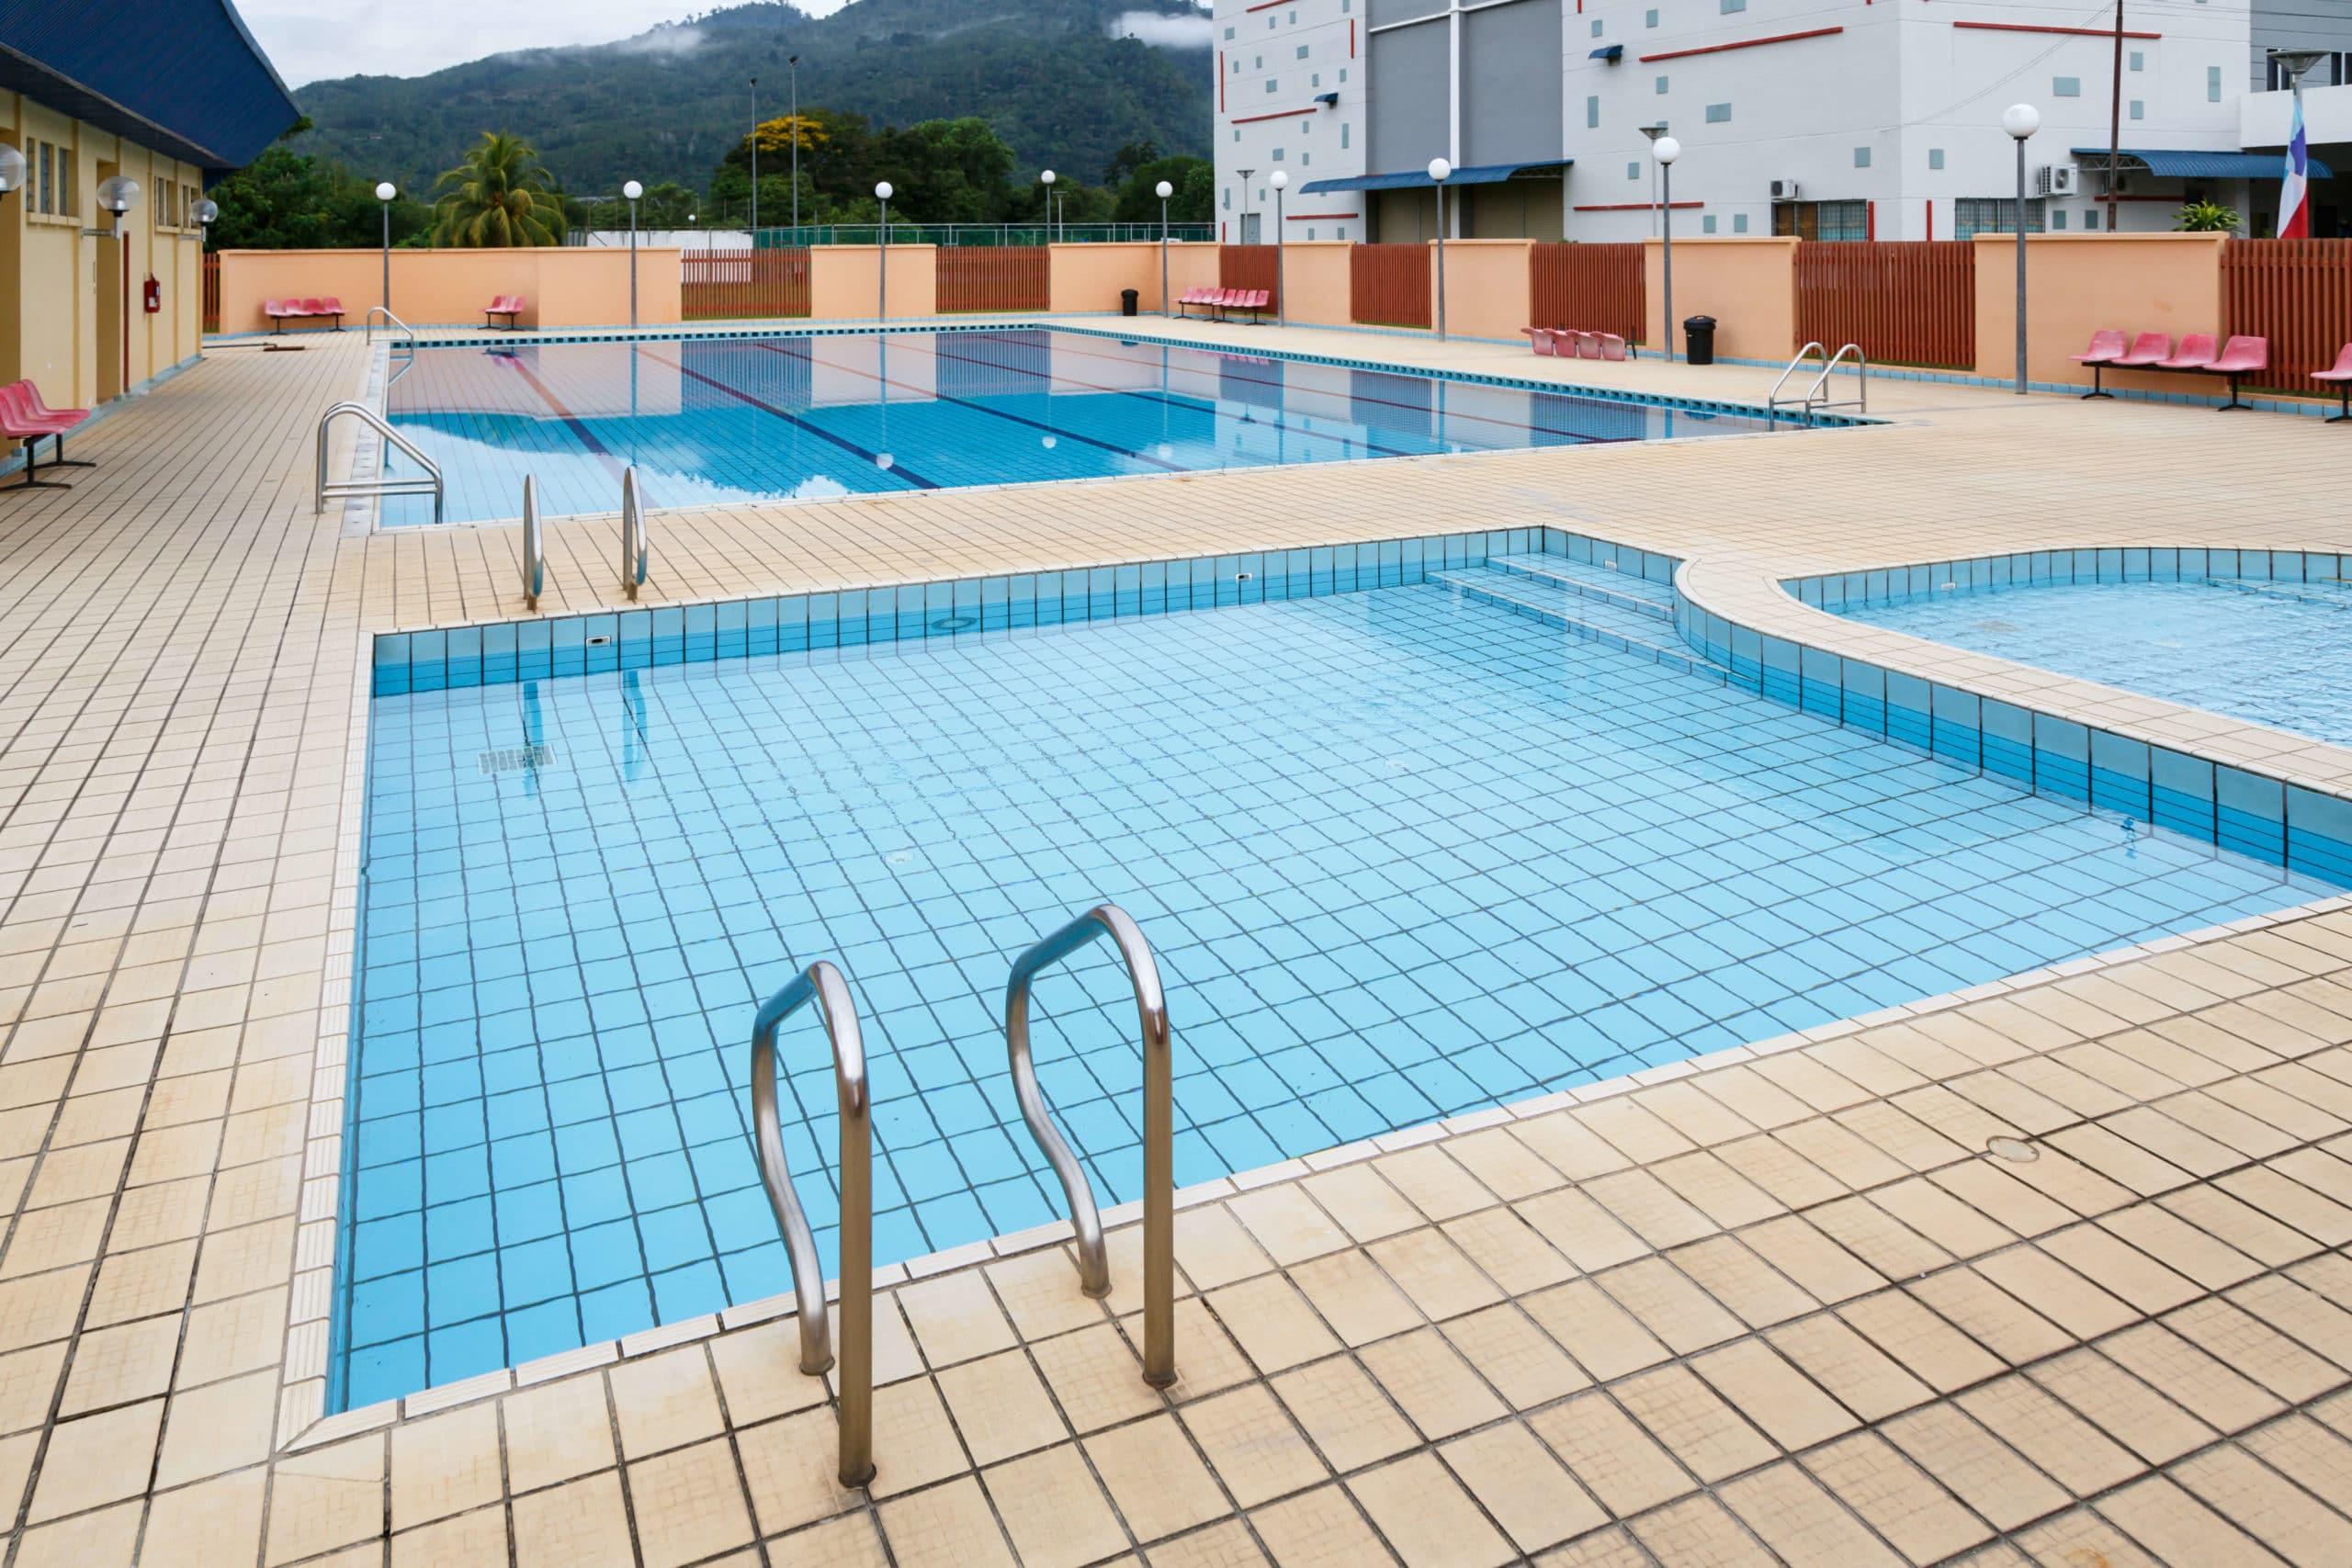 Diy Swimming Pool Ideas Backyard Pool Maintenance